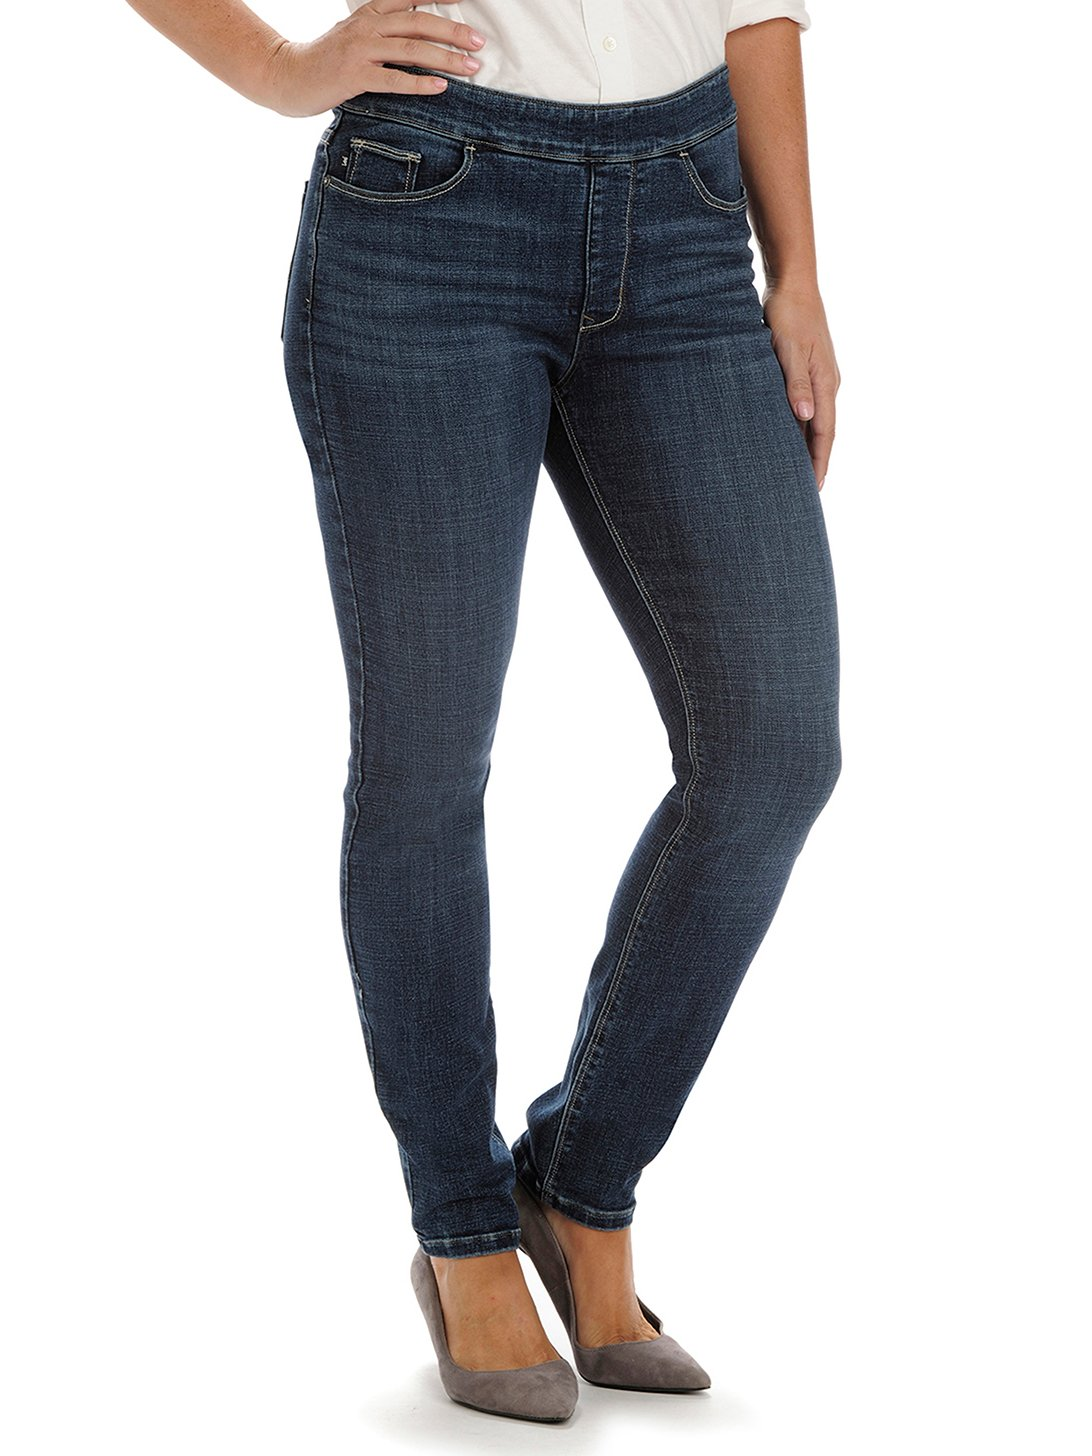 Lee Women's Modern Series Midrise Dream Jean - Harmony Legging, Lakeshore, 8